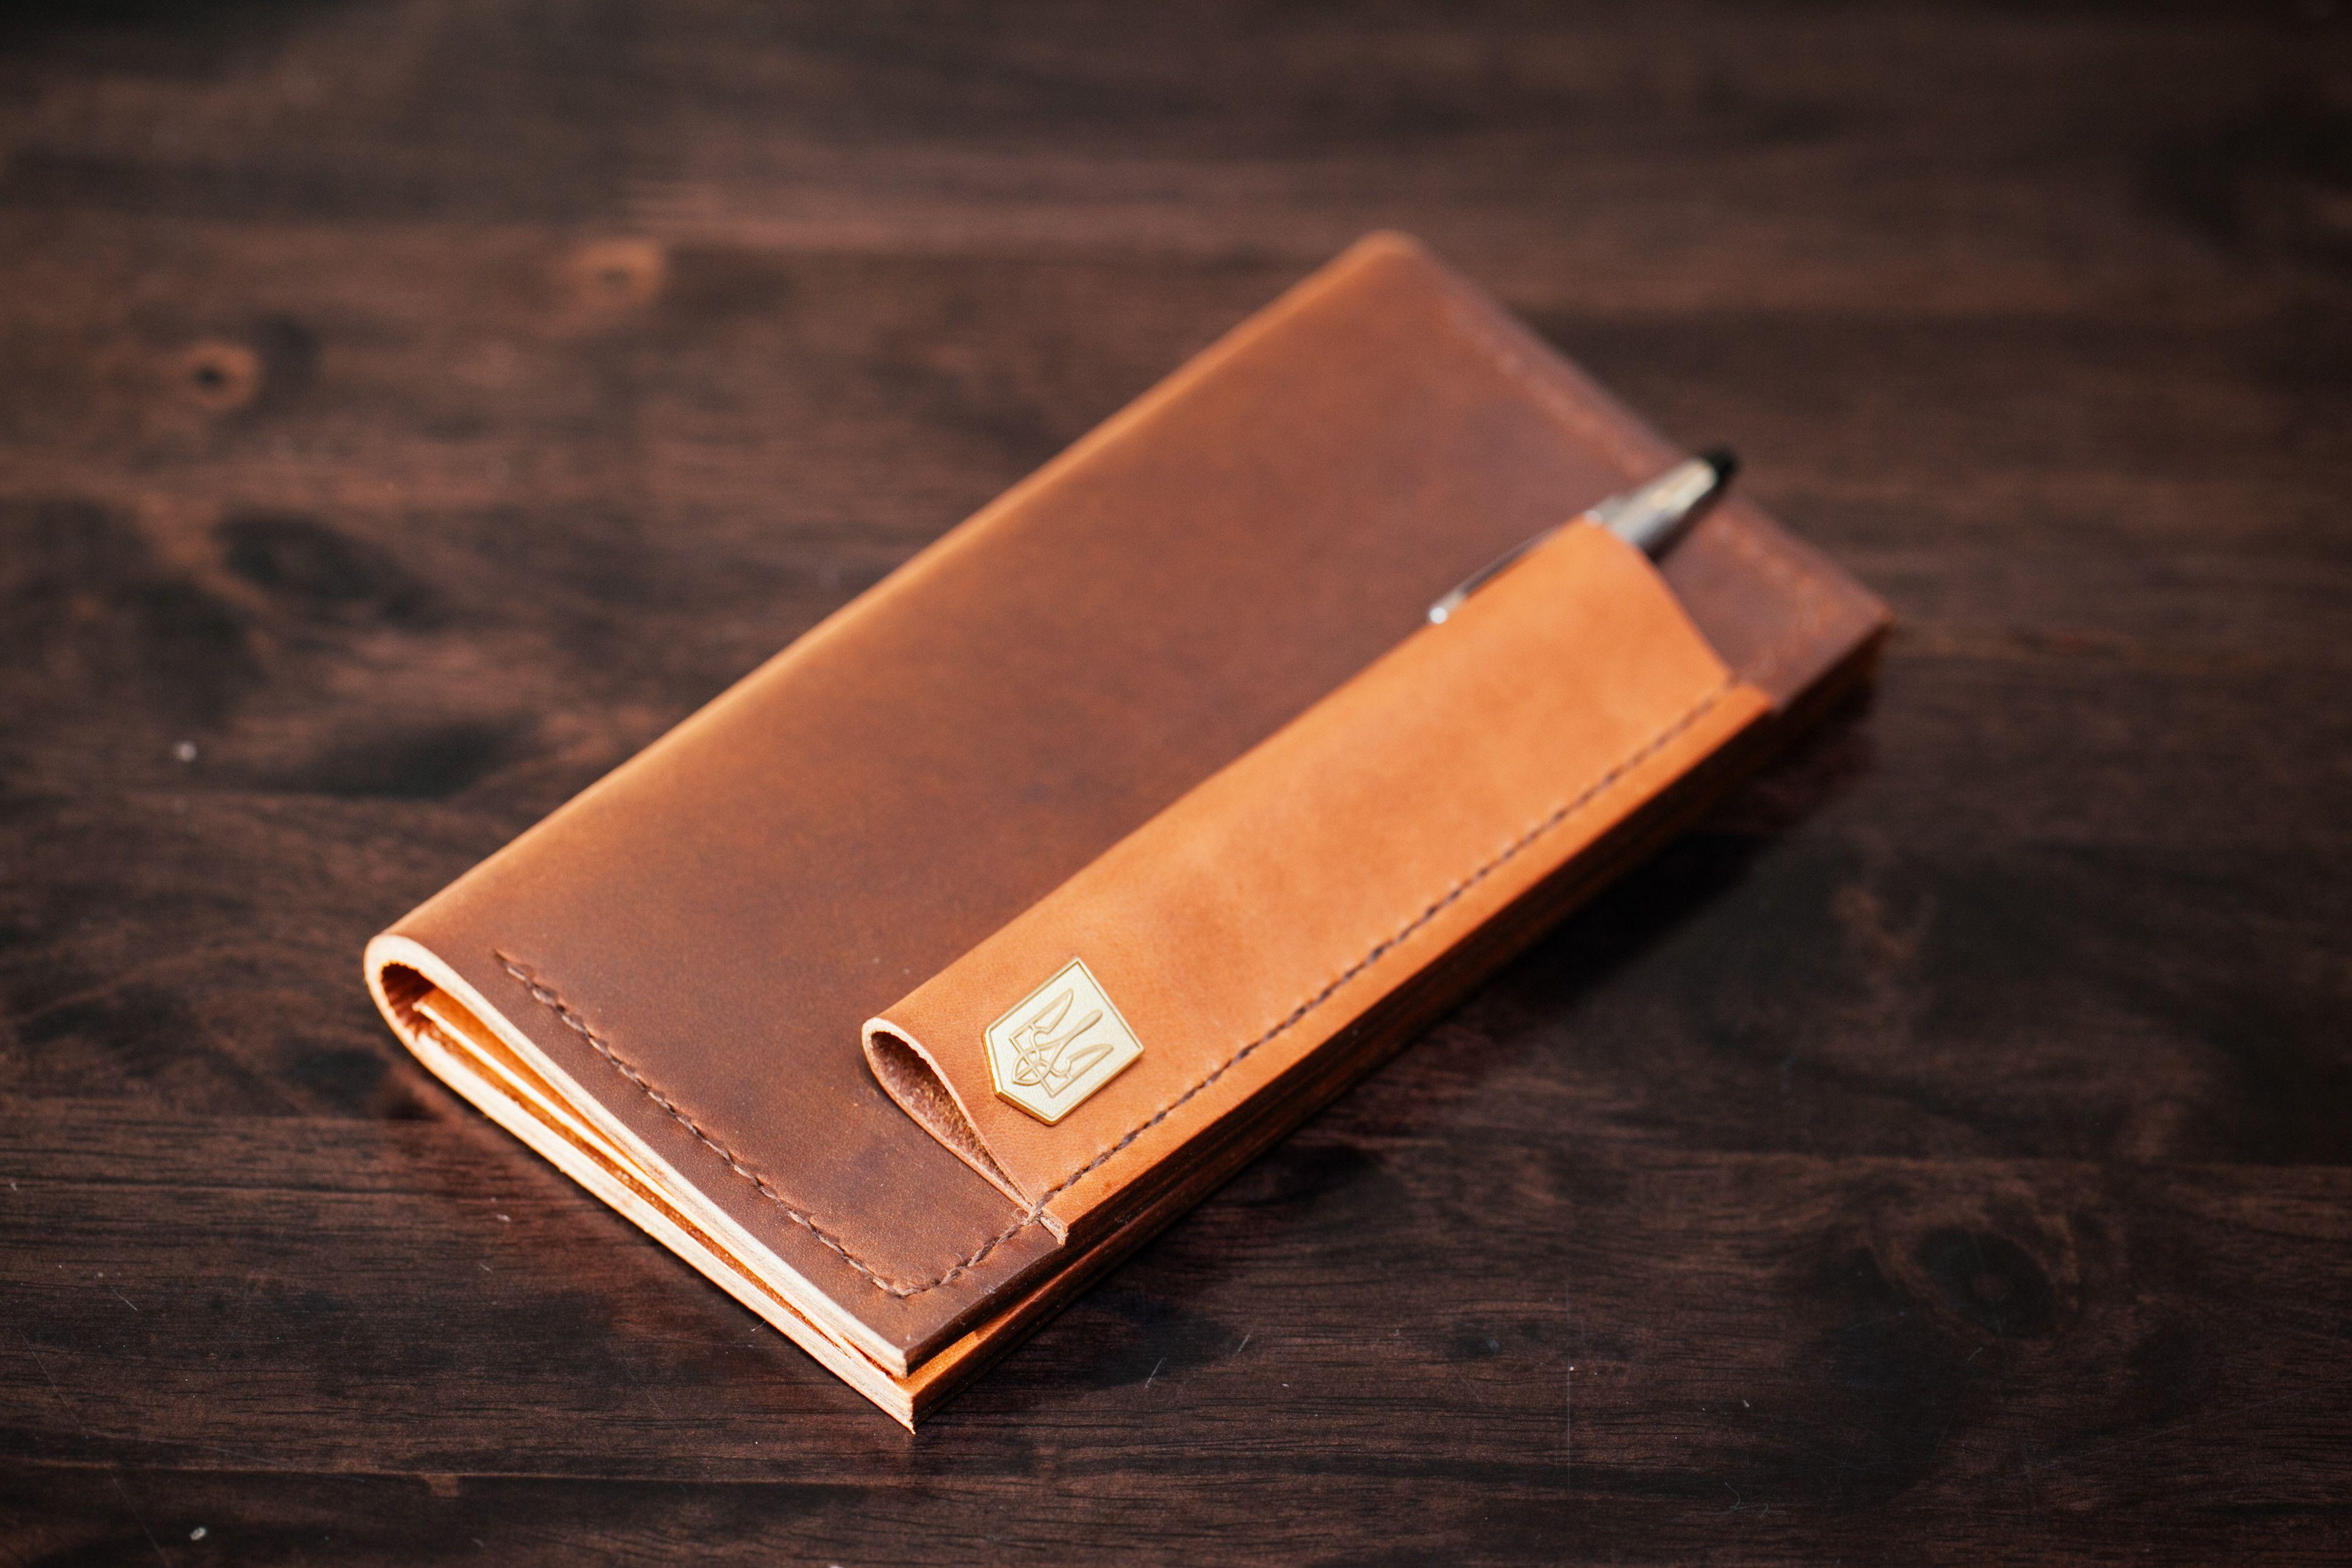 handmade bespoke leather checkbook cover leathercraft checkbook rh pinterest com